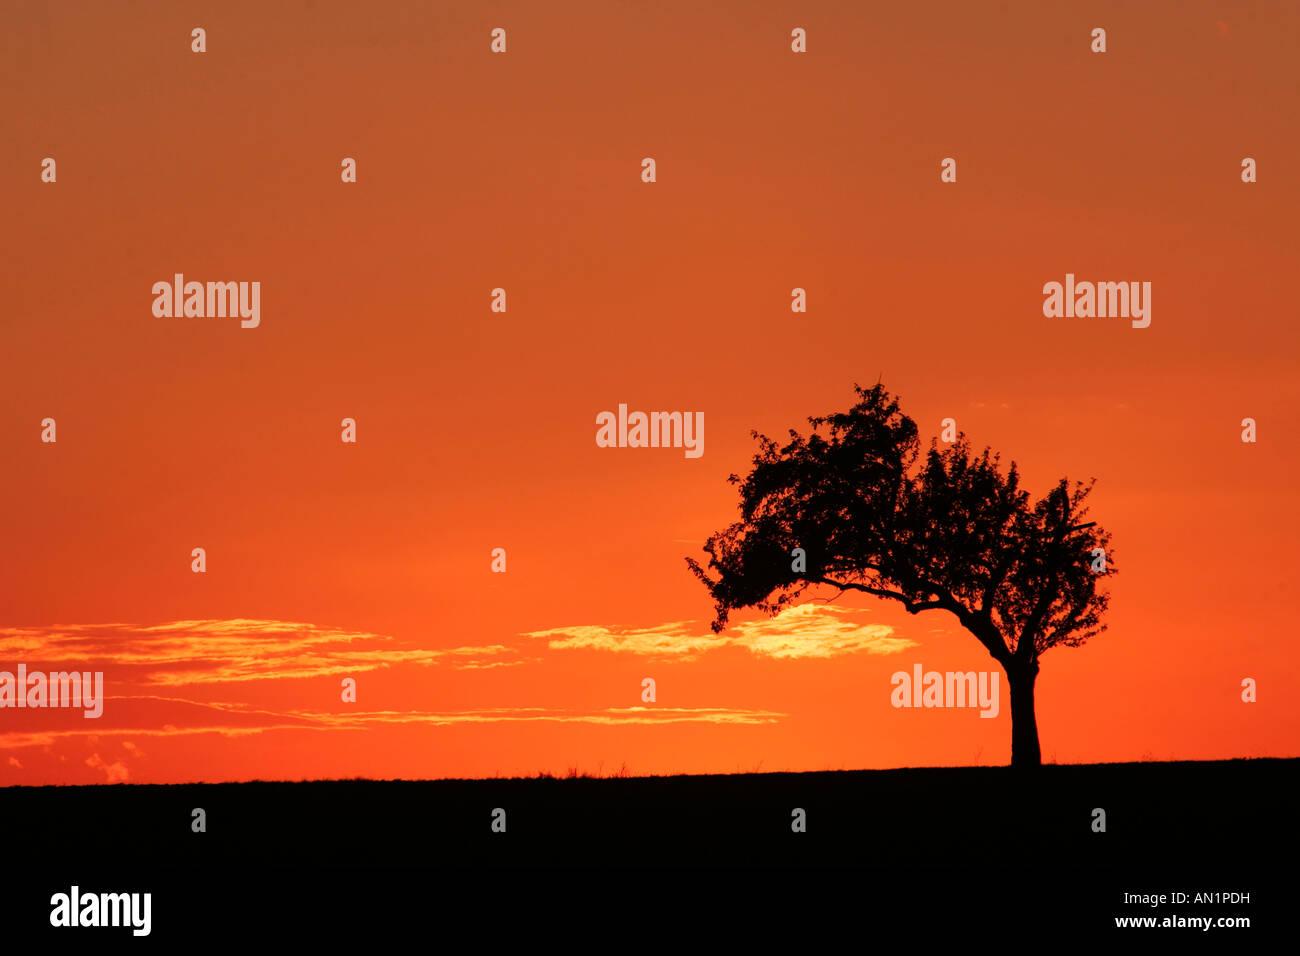 Baum Im Raummotive Baum im Sonnenuntergang Stockbild